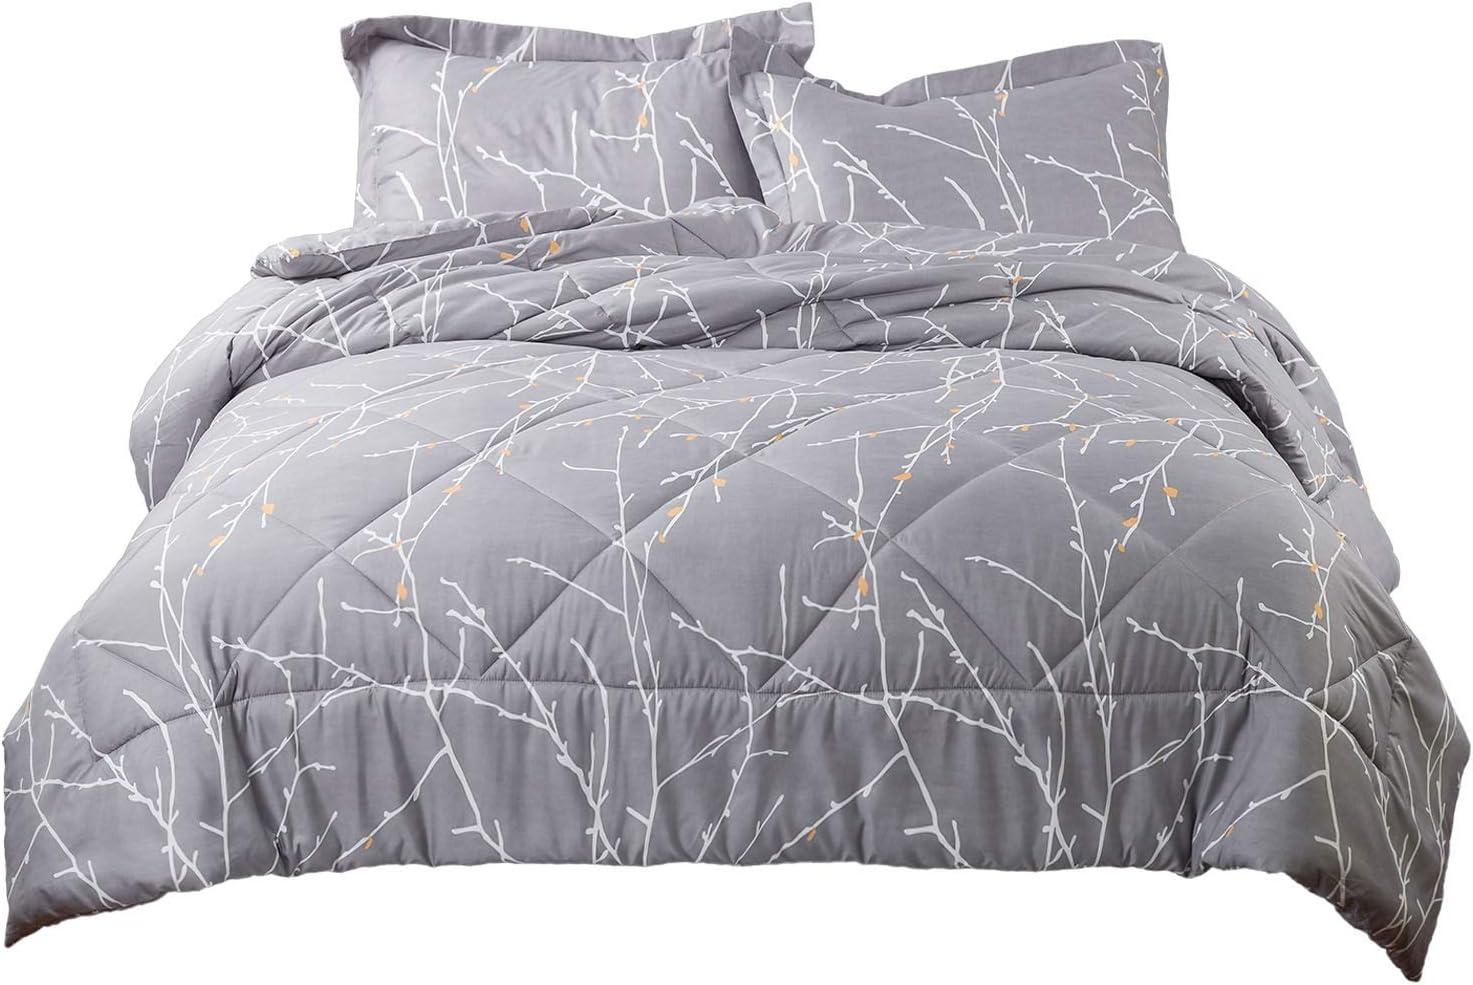 Bedsure Down Alternative Comforter Set King Size Grey Reversible Sherpa Duvet In